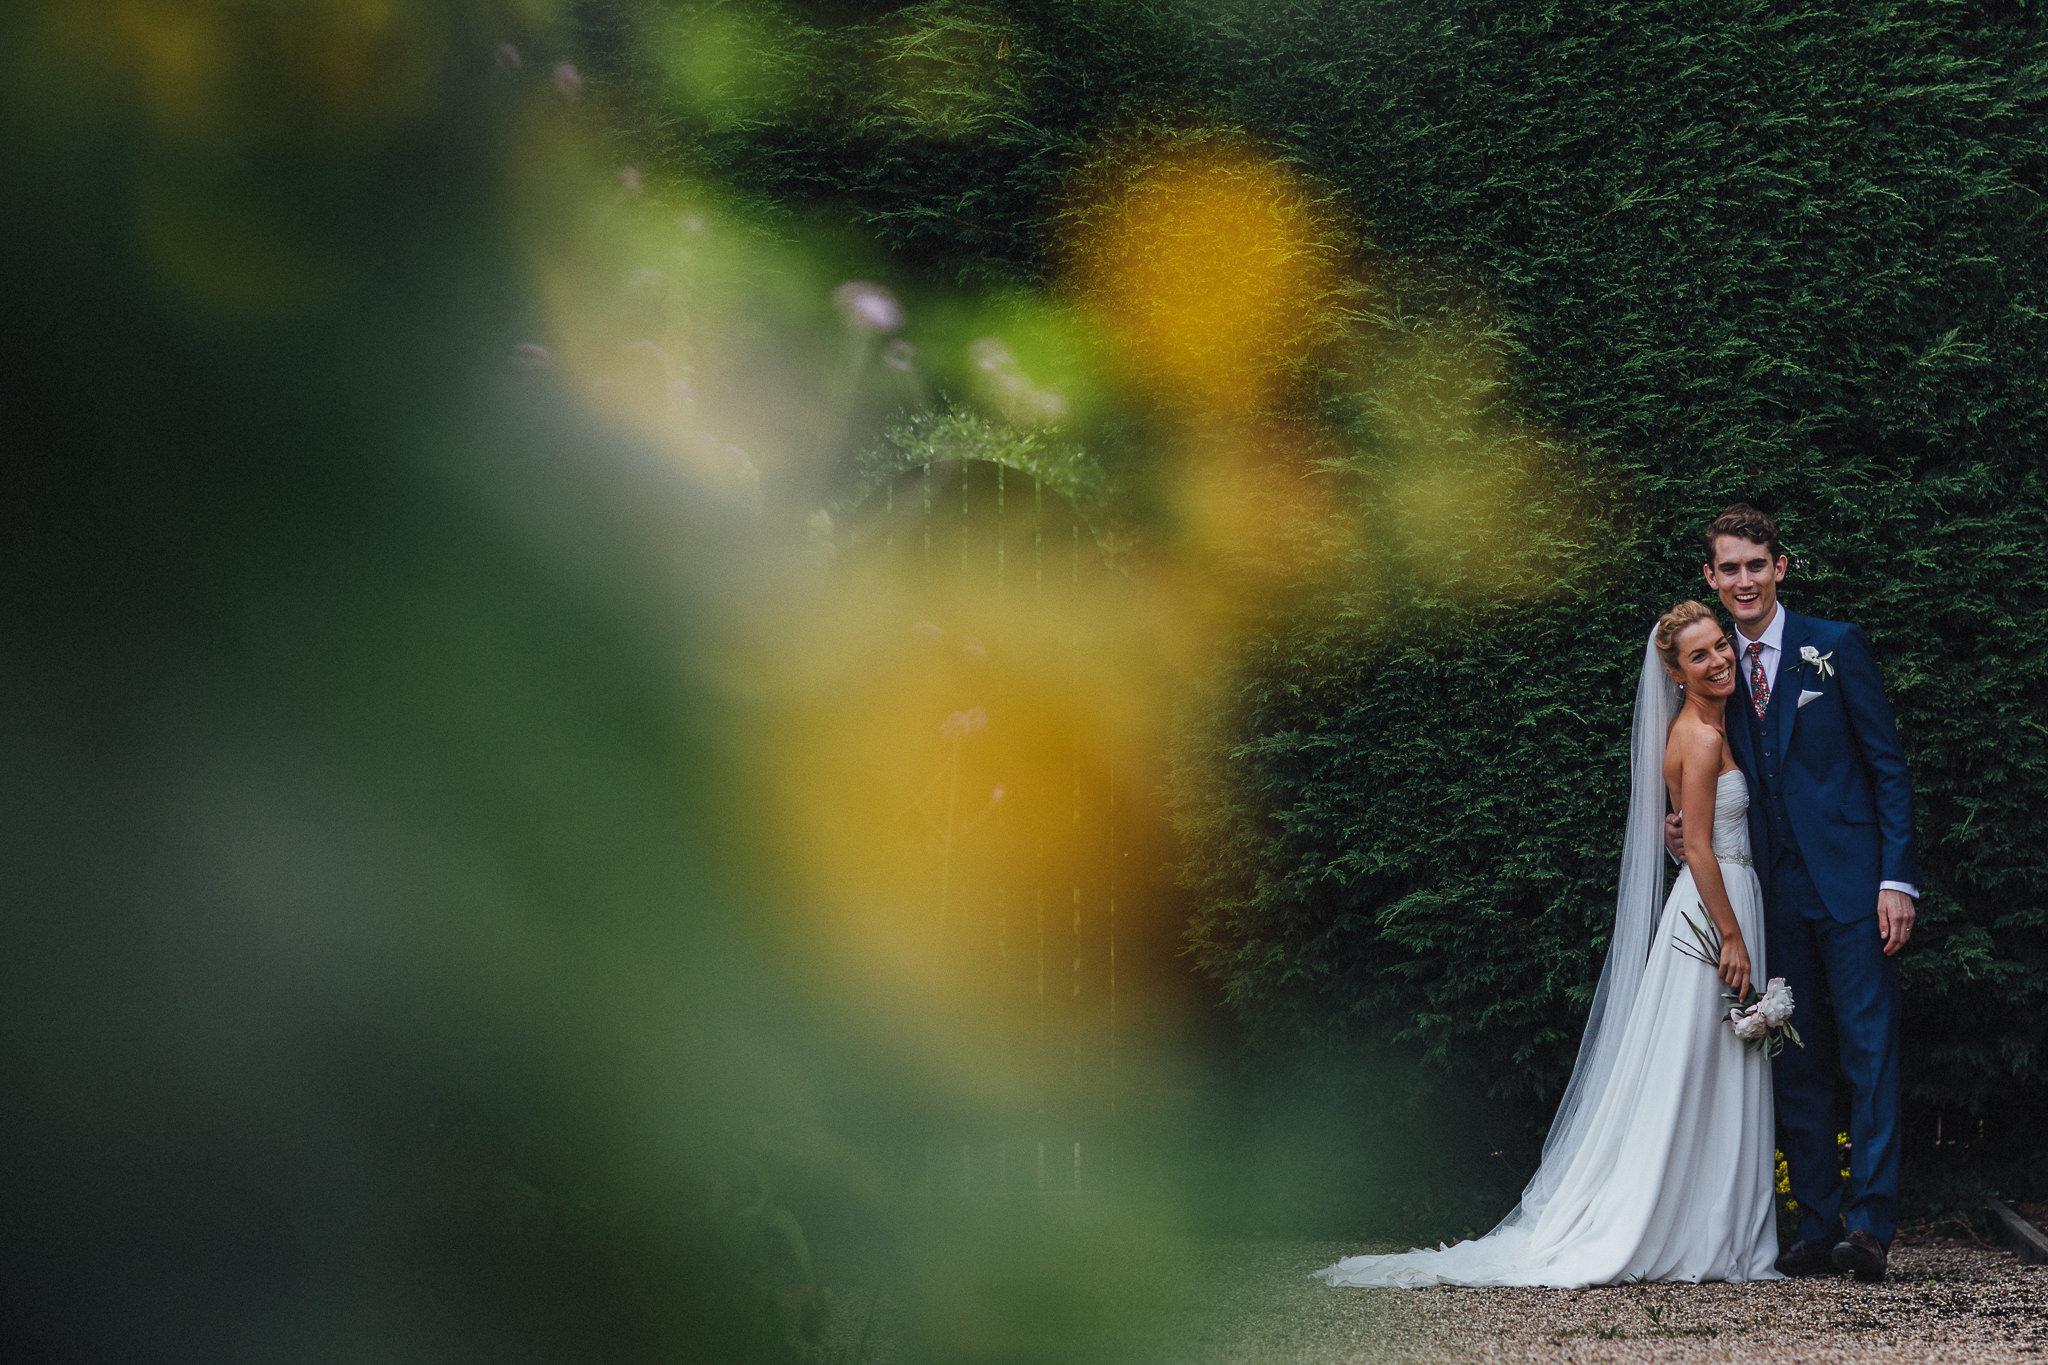 paul-marbrook-Gaynes-Park Wedding-Photographer-90096